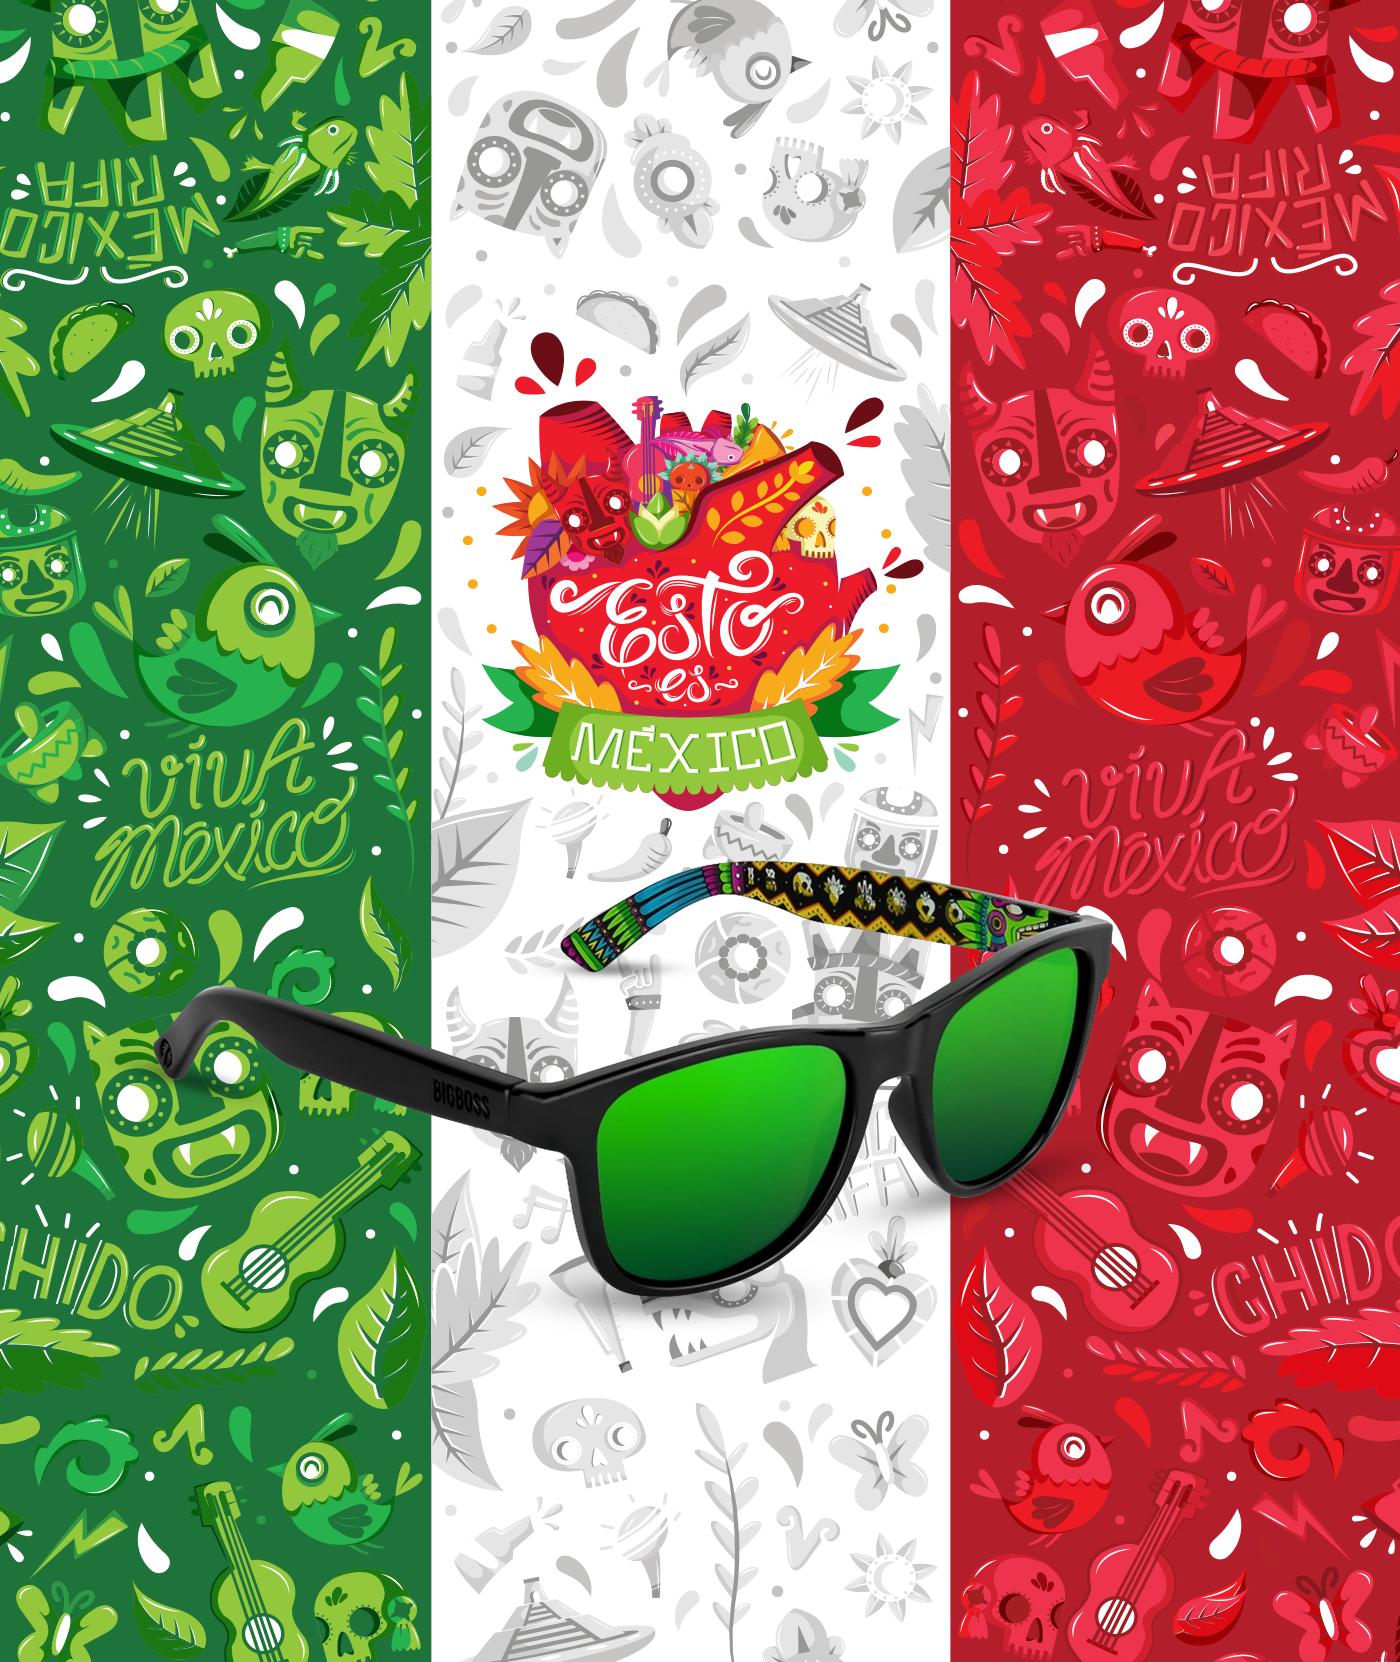 Echa Un Vistazo A Este Proyecto Behance Esto Es Mexico Big Boss Sunglasses Https Www Behance Net Gallery 6506840 Cat Eye Sunglasses Eye Sunglasses Amor